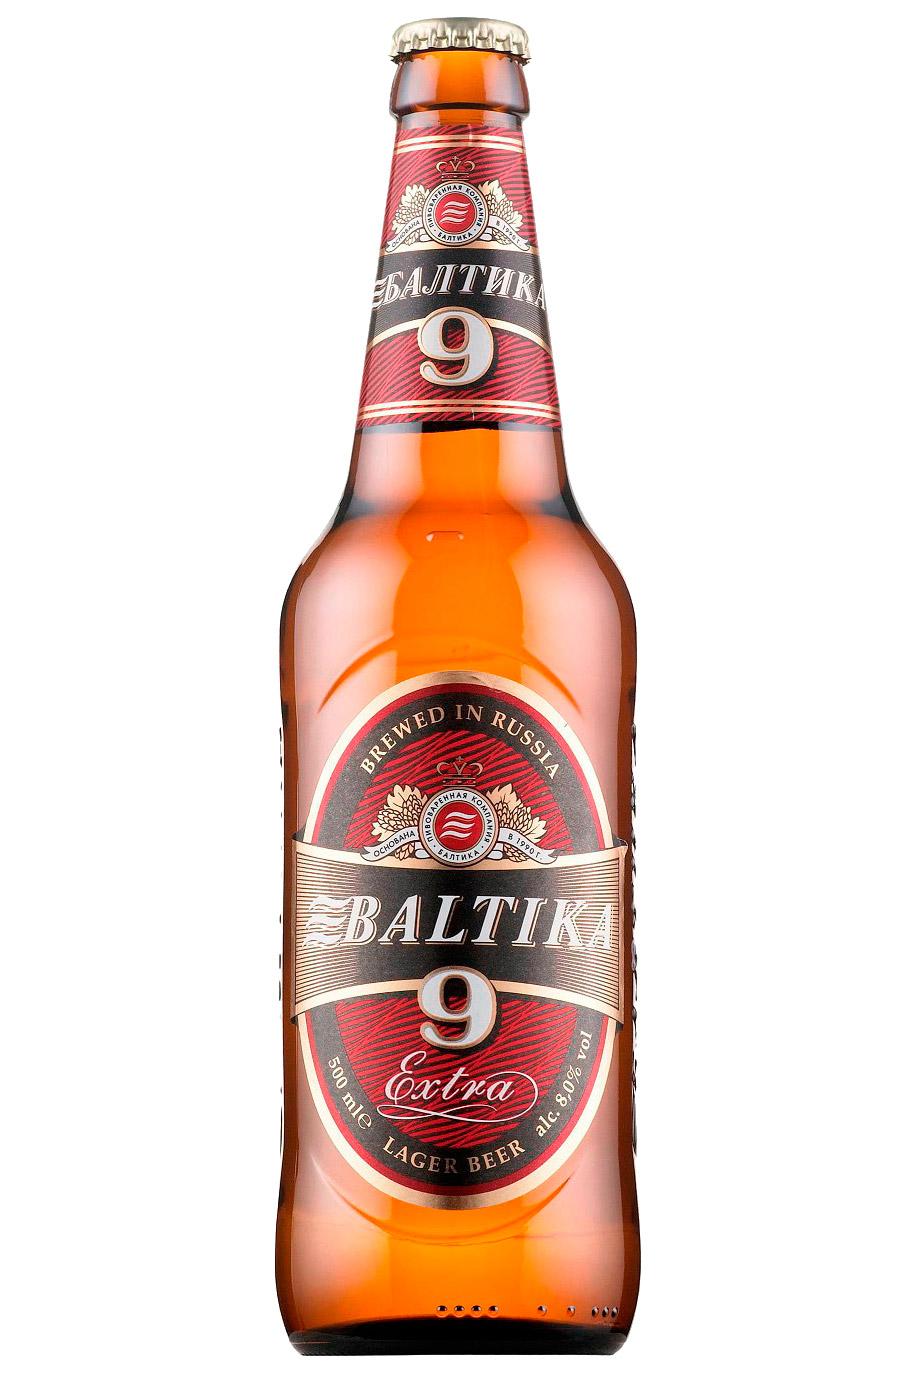 PIVO RUSKO BALTIKA #9, 8% alkohola, Rusija z dostavo v Sloveniji